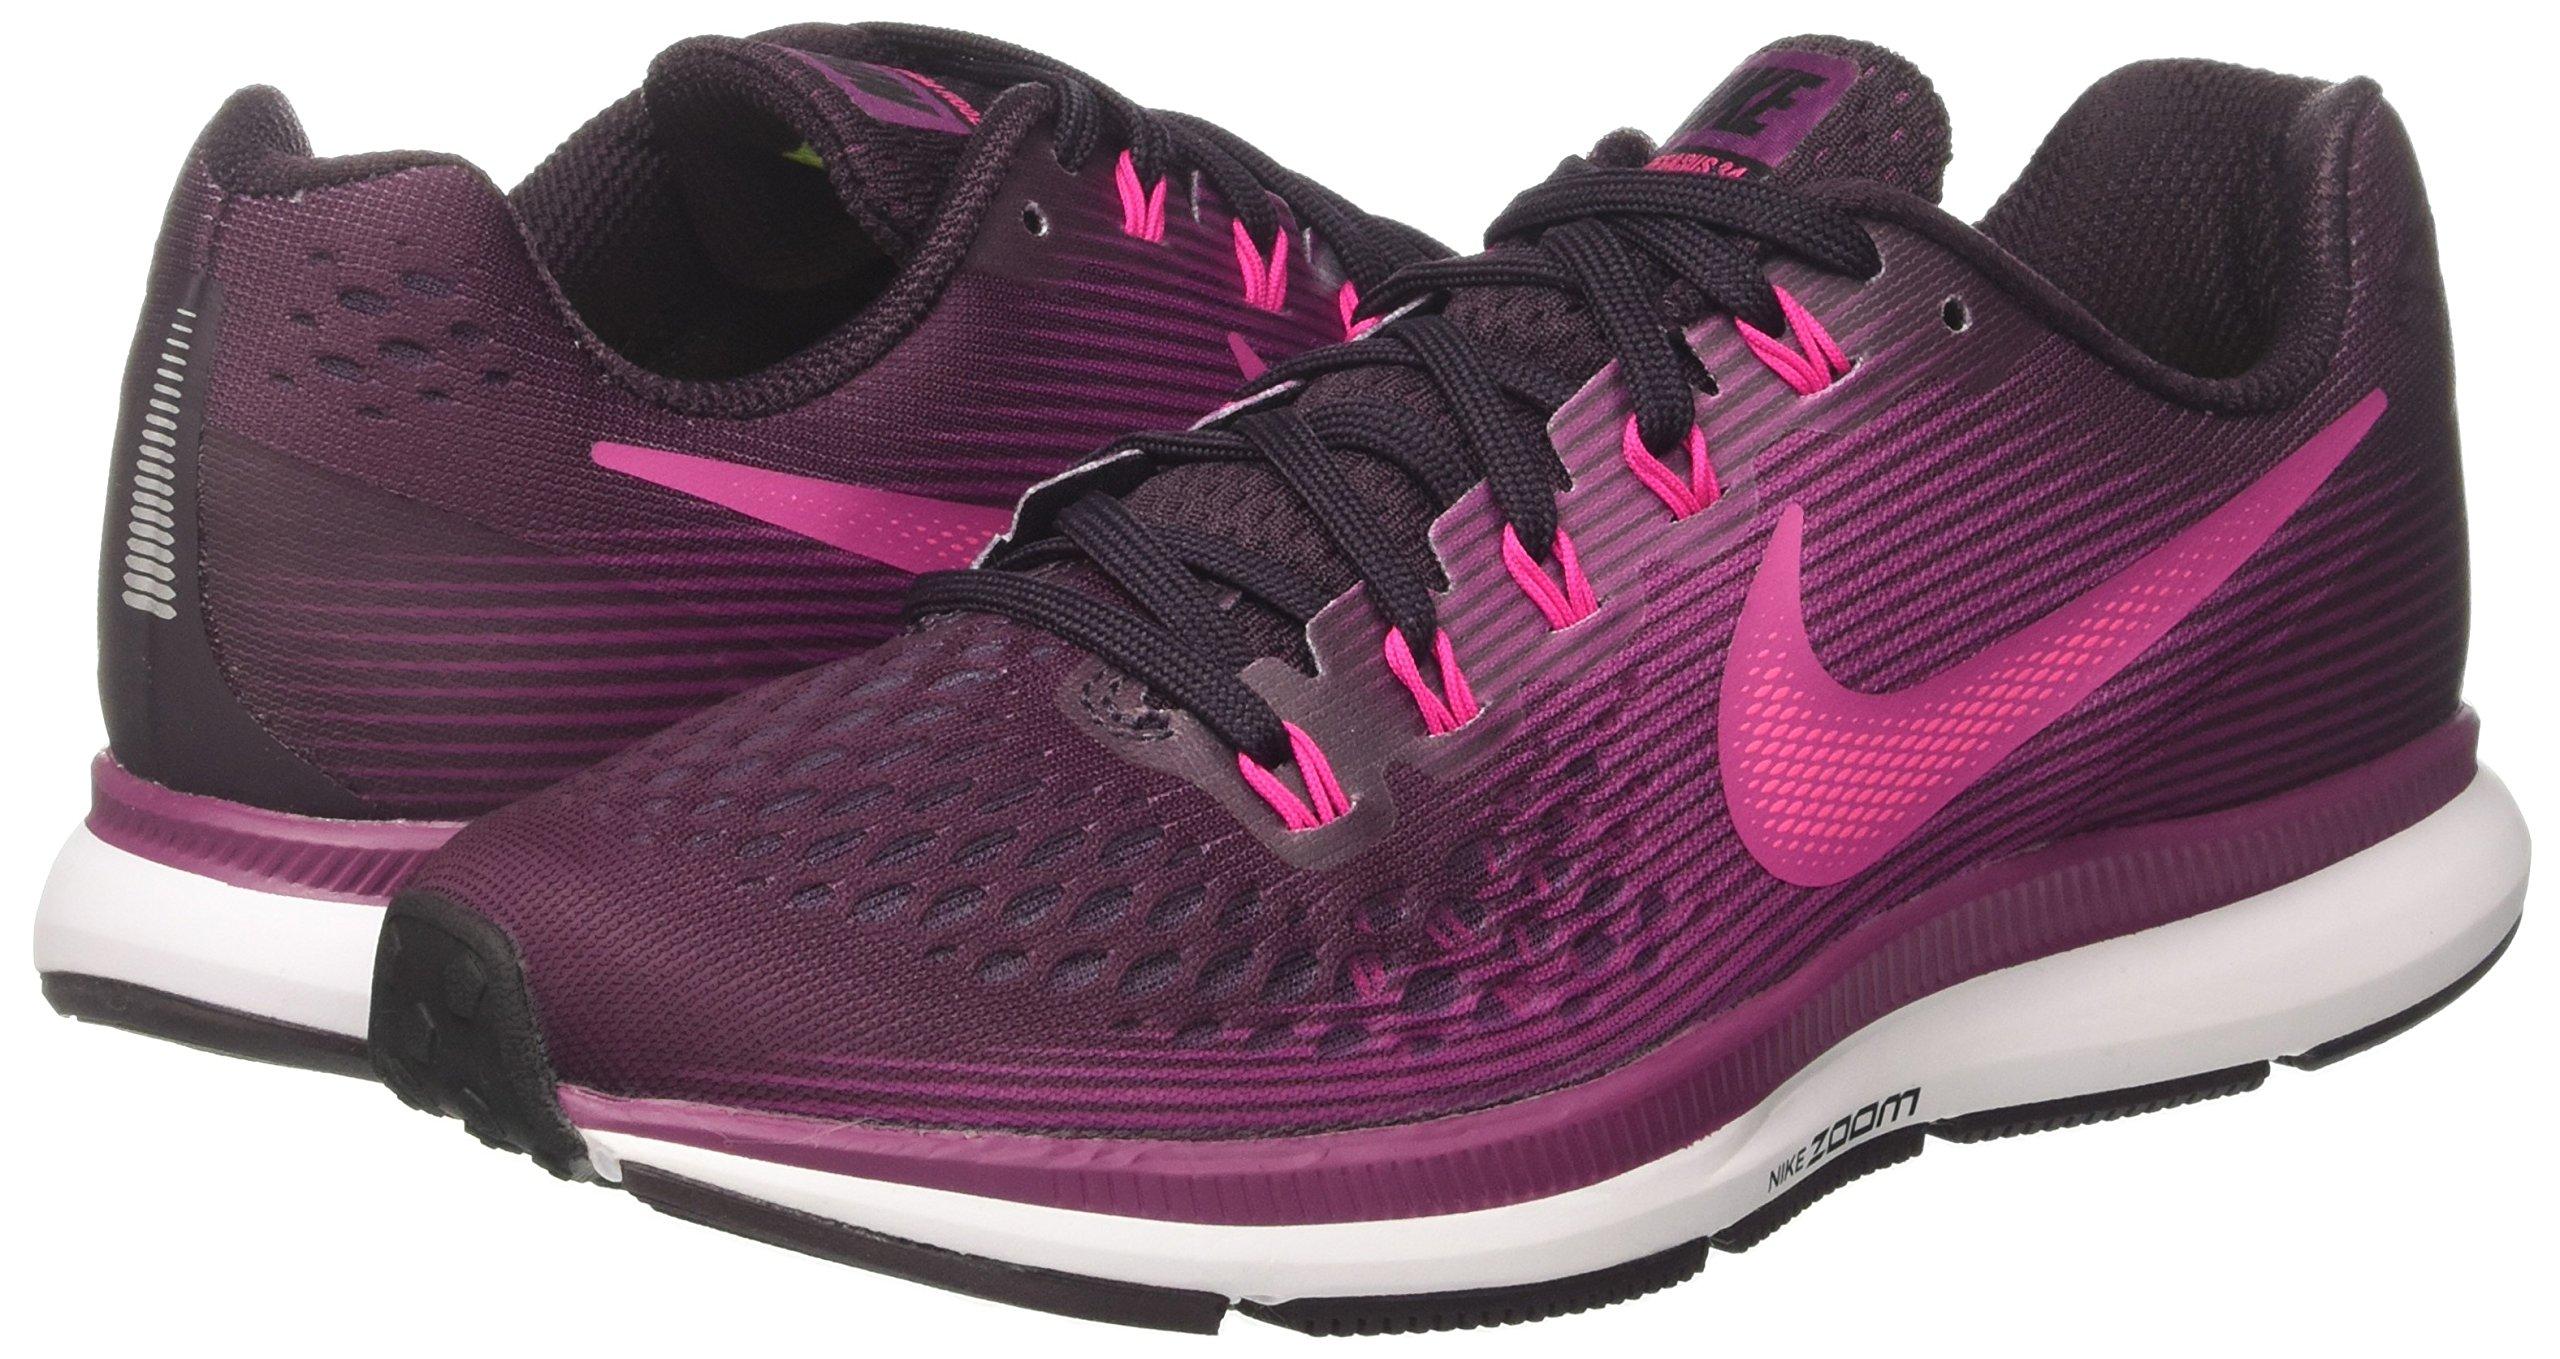 NIKE Women's Air Zoom Pegasus 34 Port Wine/Deadly Pink Running Shoe 7 Women US by NIKE (Image #5)